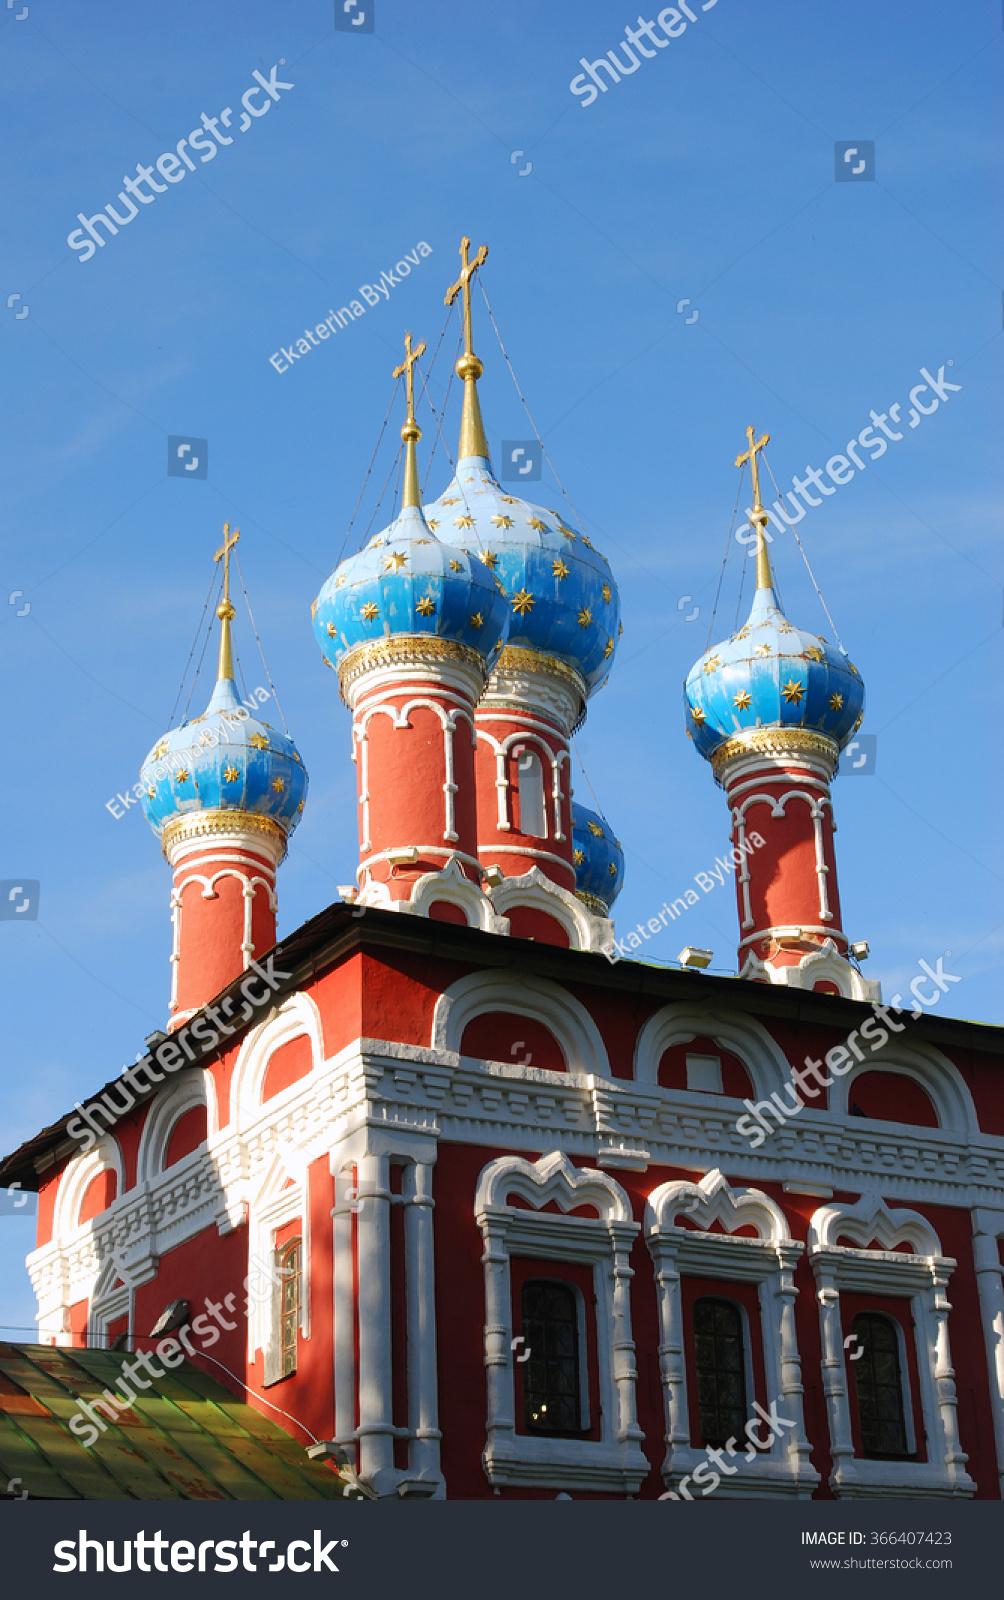 Church dimitry on spilled blood kremlin stock photo for Famous landmarks in russia